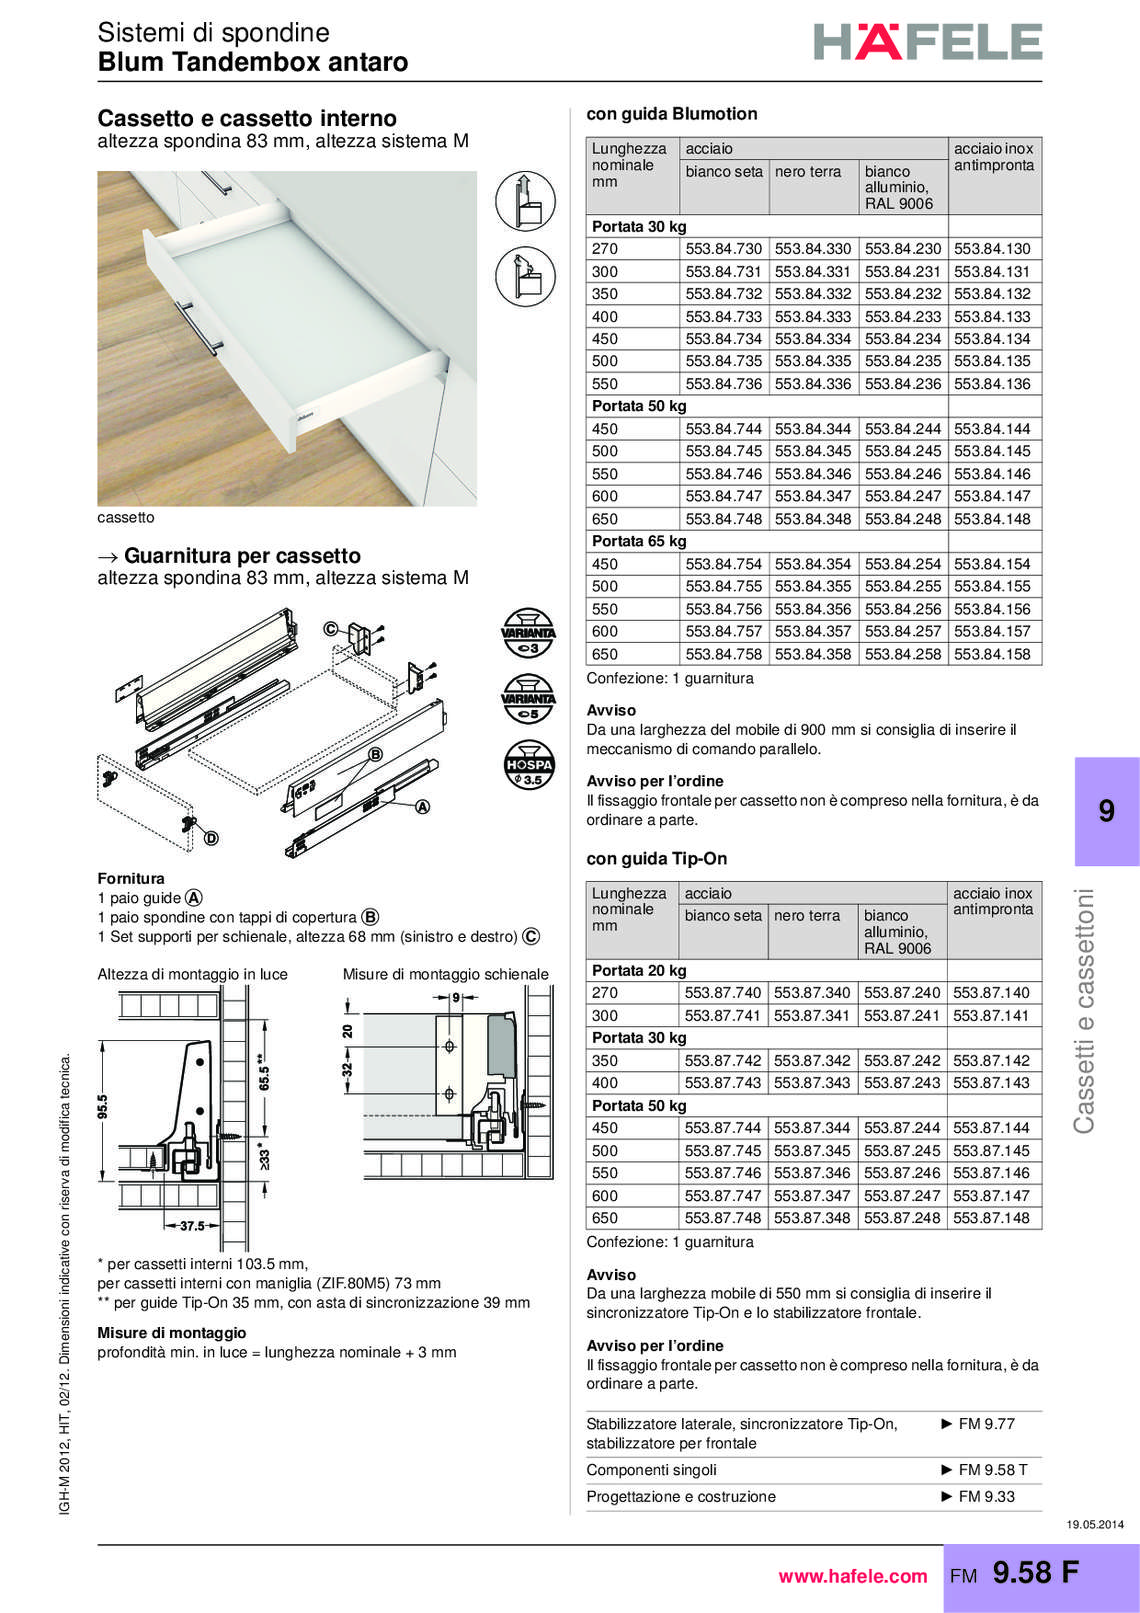 hafele-spondine-e-guide-per-mobili_40_080.jpg